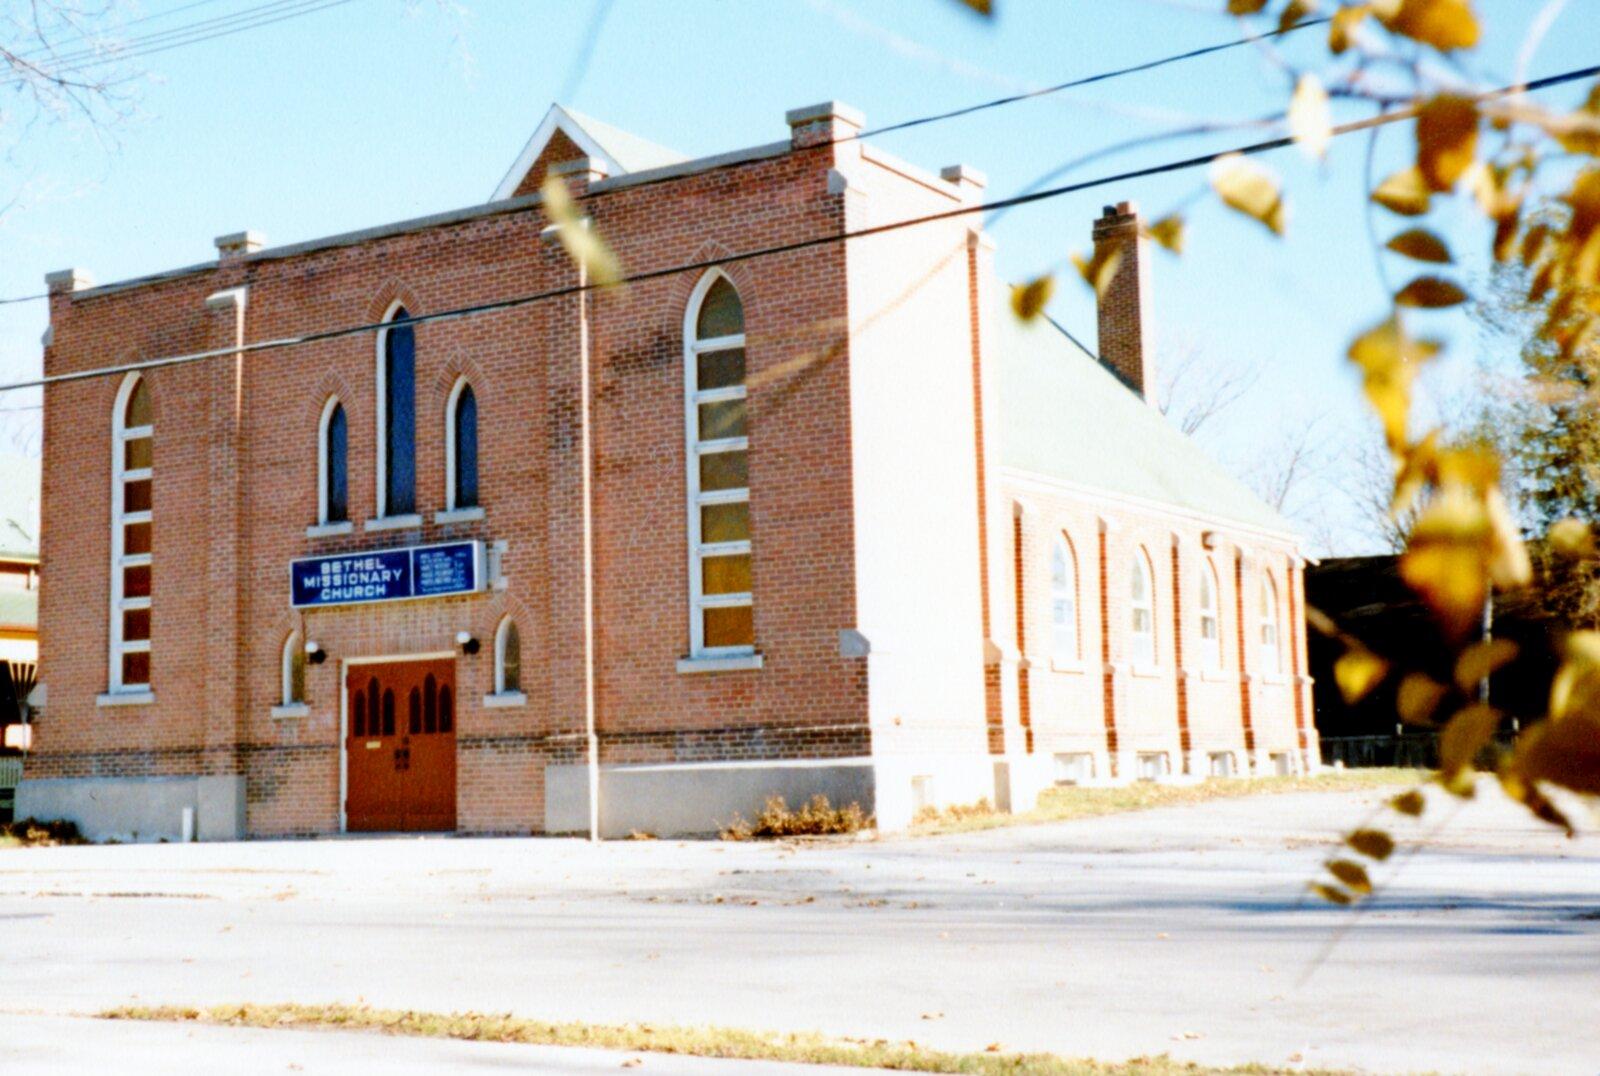 Lindsay Apostolic Church of Pentecost